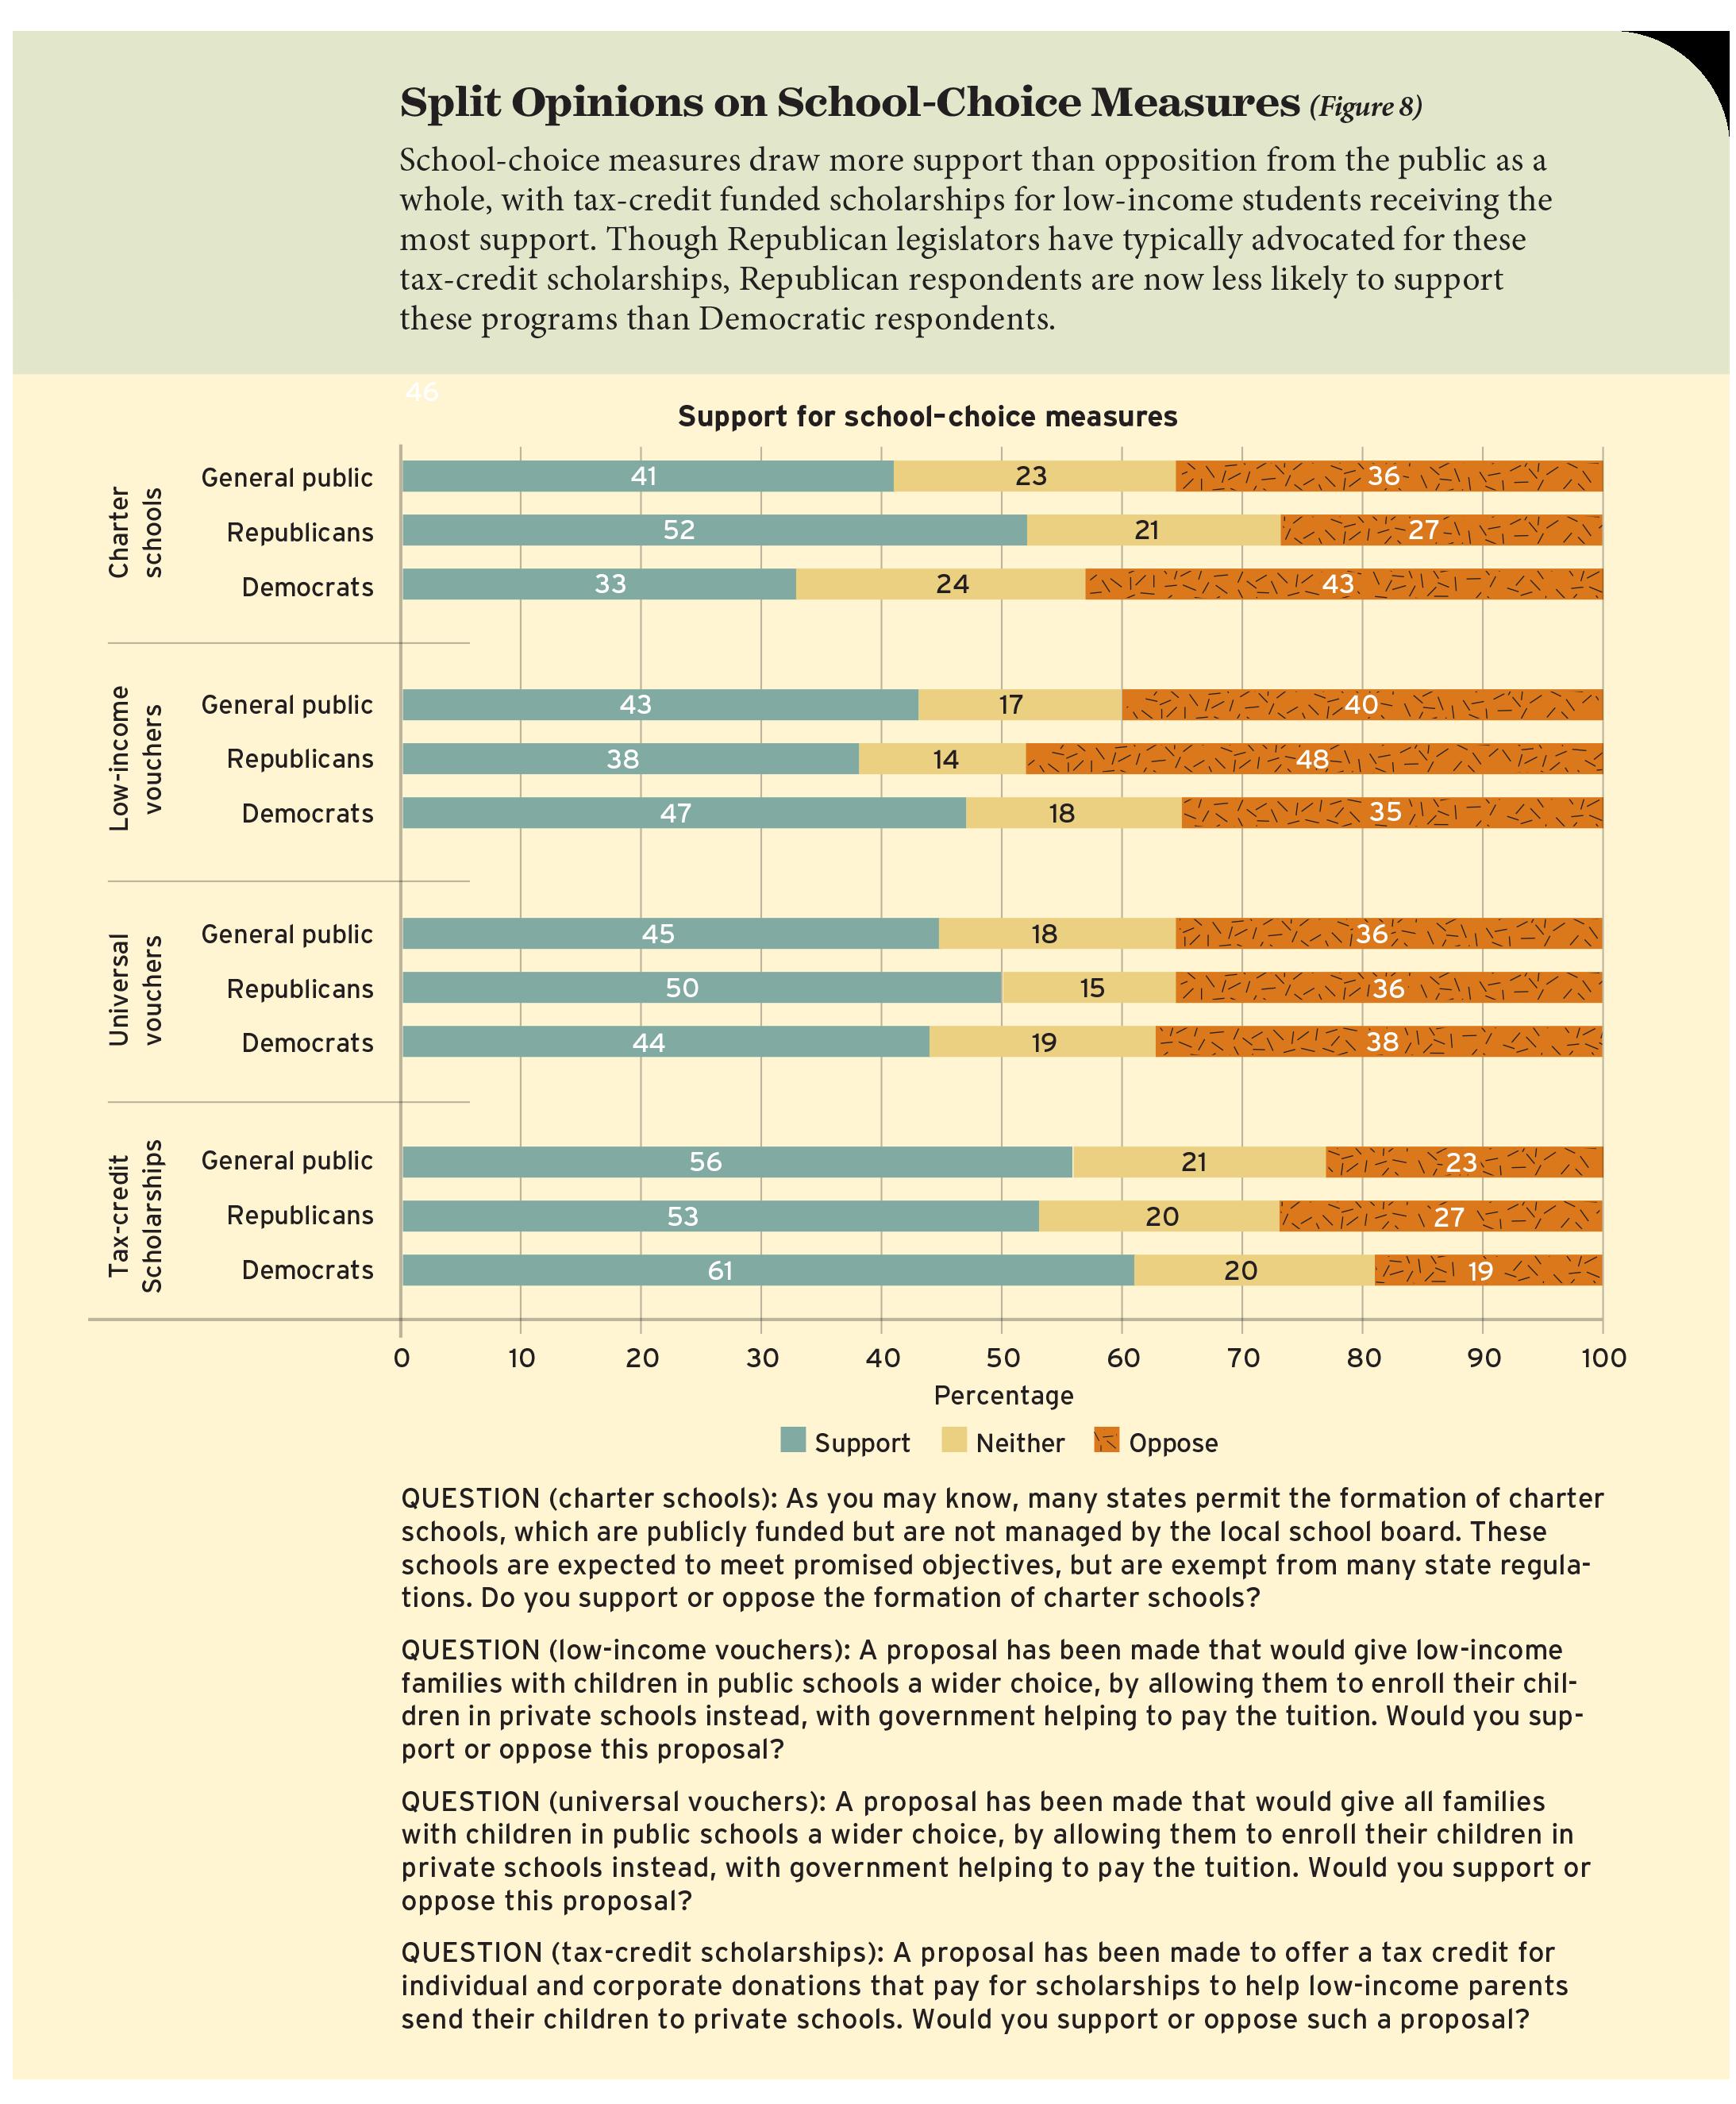 Split Opinions on School-Choice Measures (Figure 8)